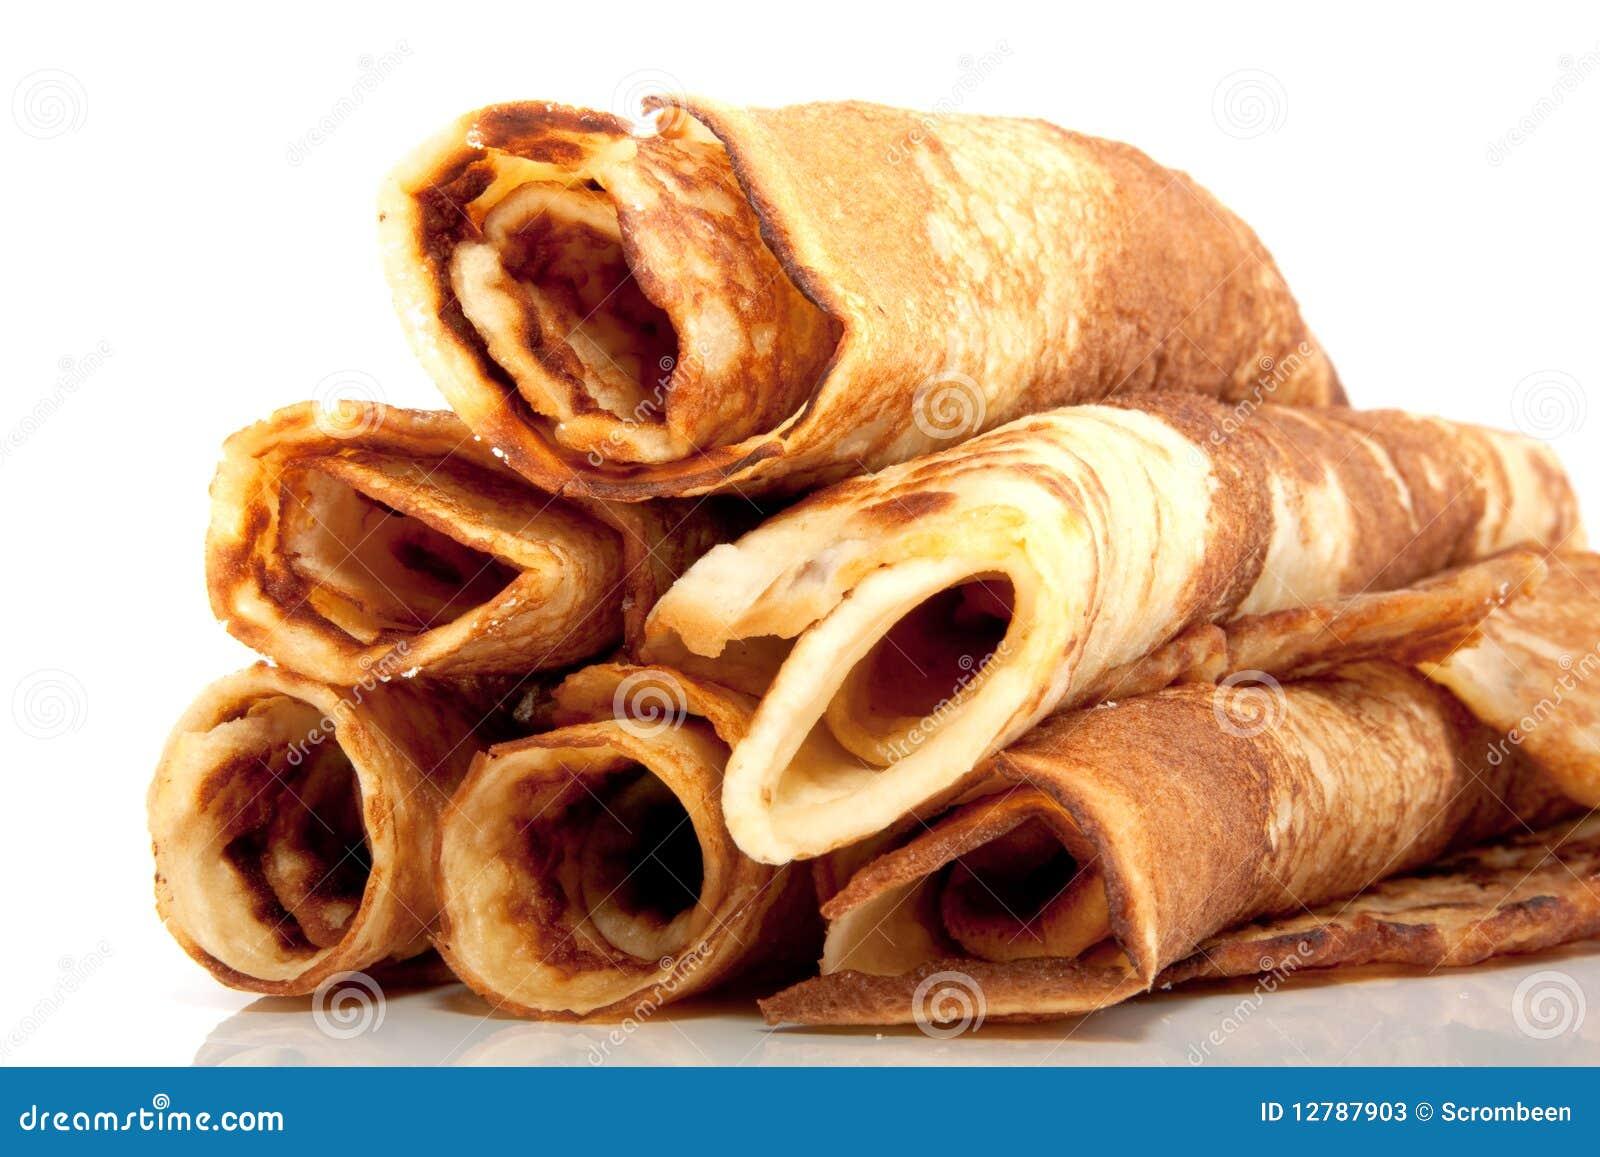 Many Rolled Pancakes Stock Photos Image 12787903